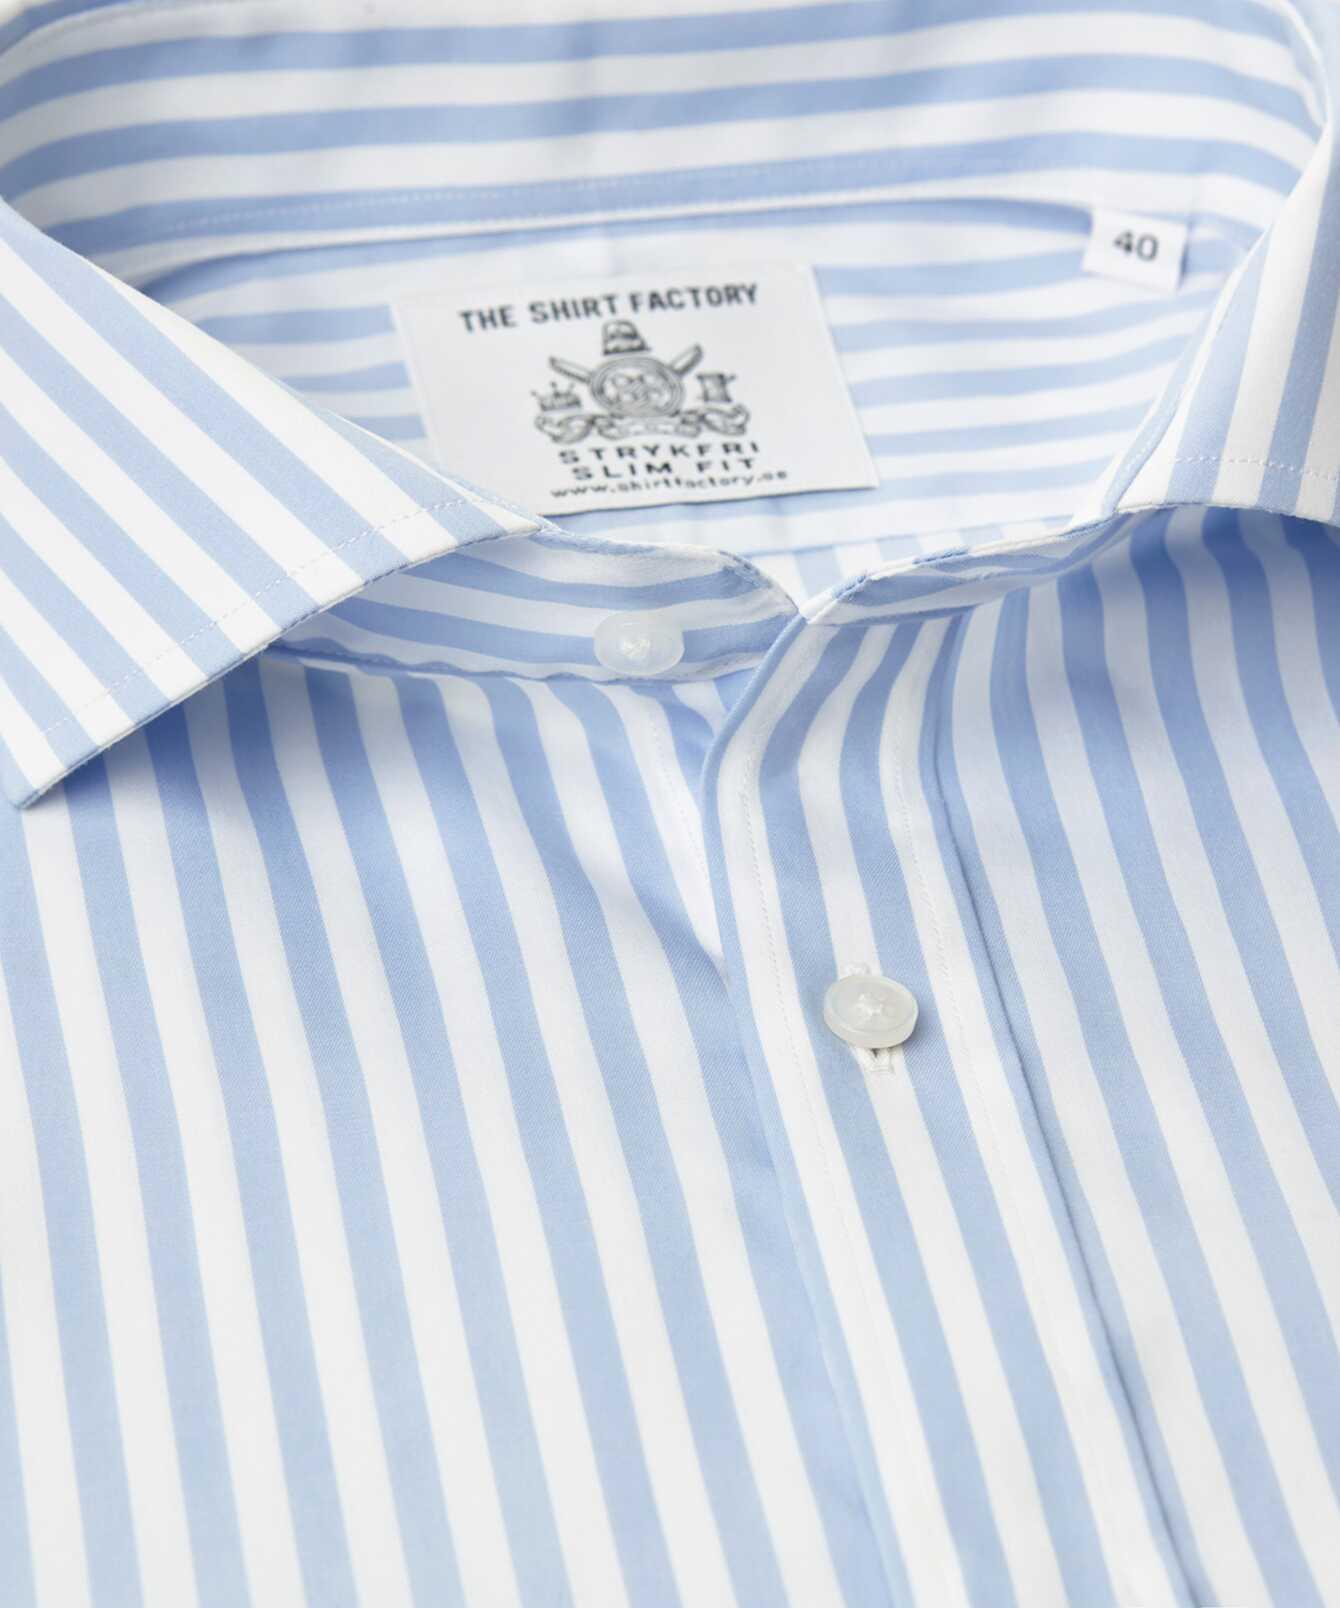 Shirt W W Riviera The Shirt Factory